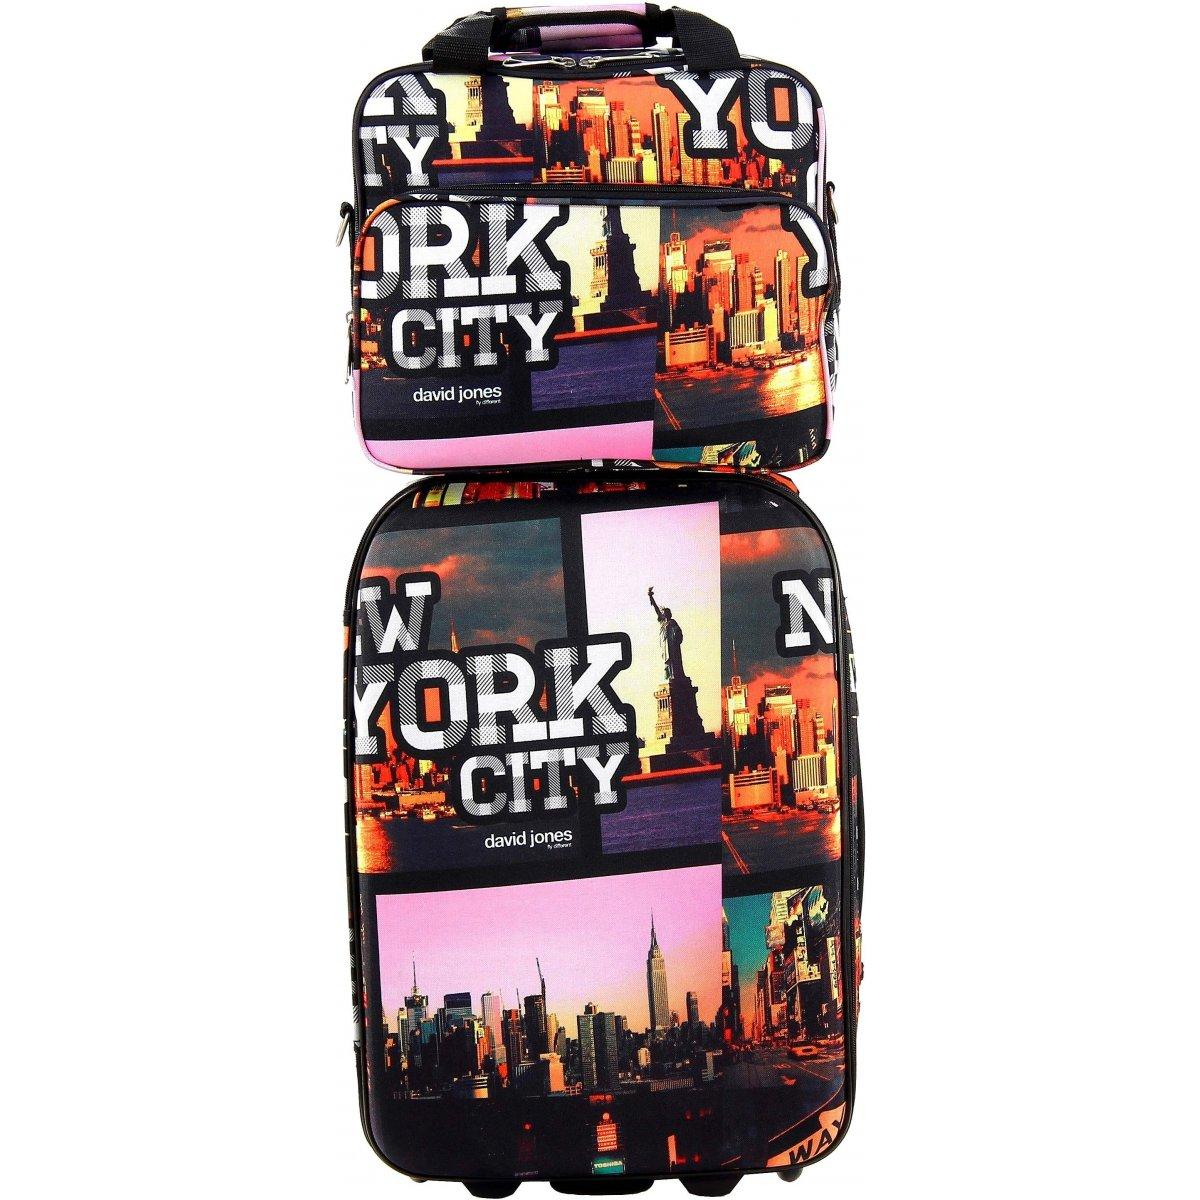 valise cabine ryanair vanity david jones r10022 couleur principale new york promotion. Black Bedroom Furniture Sets. Home Design Ideas